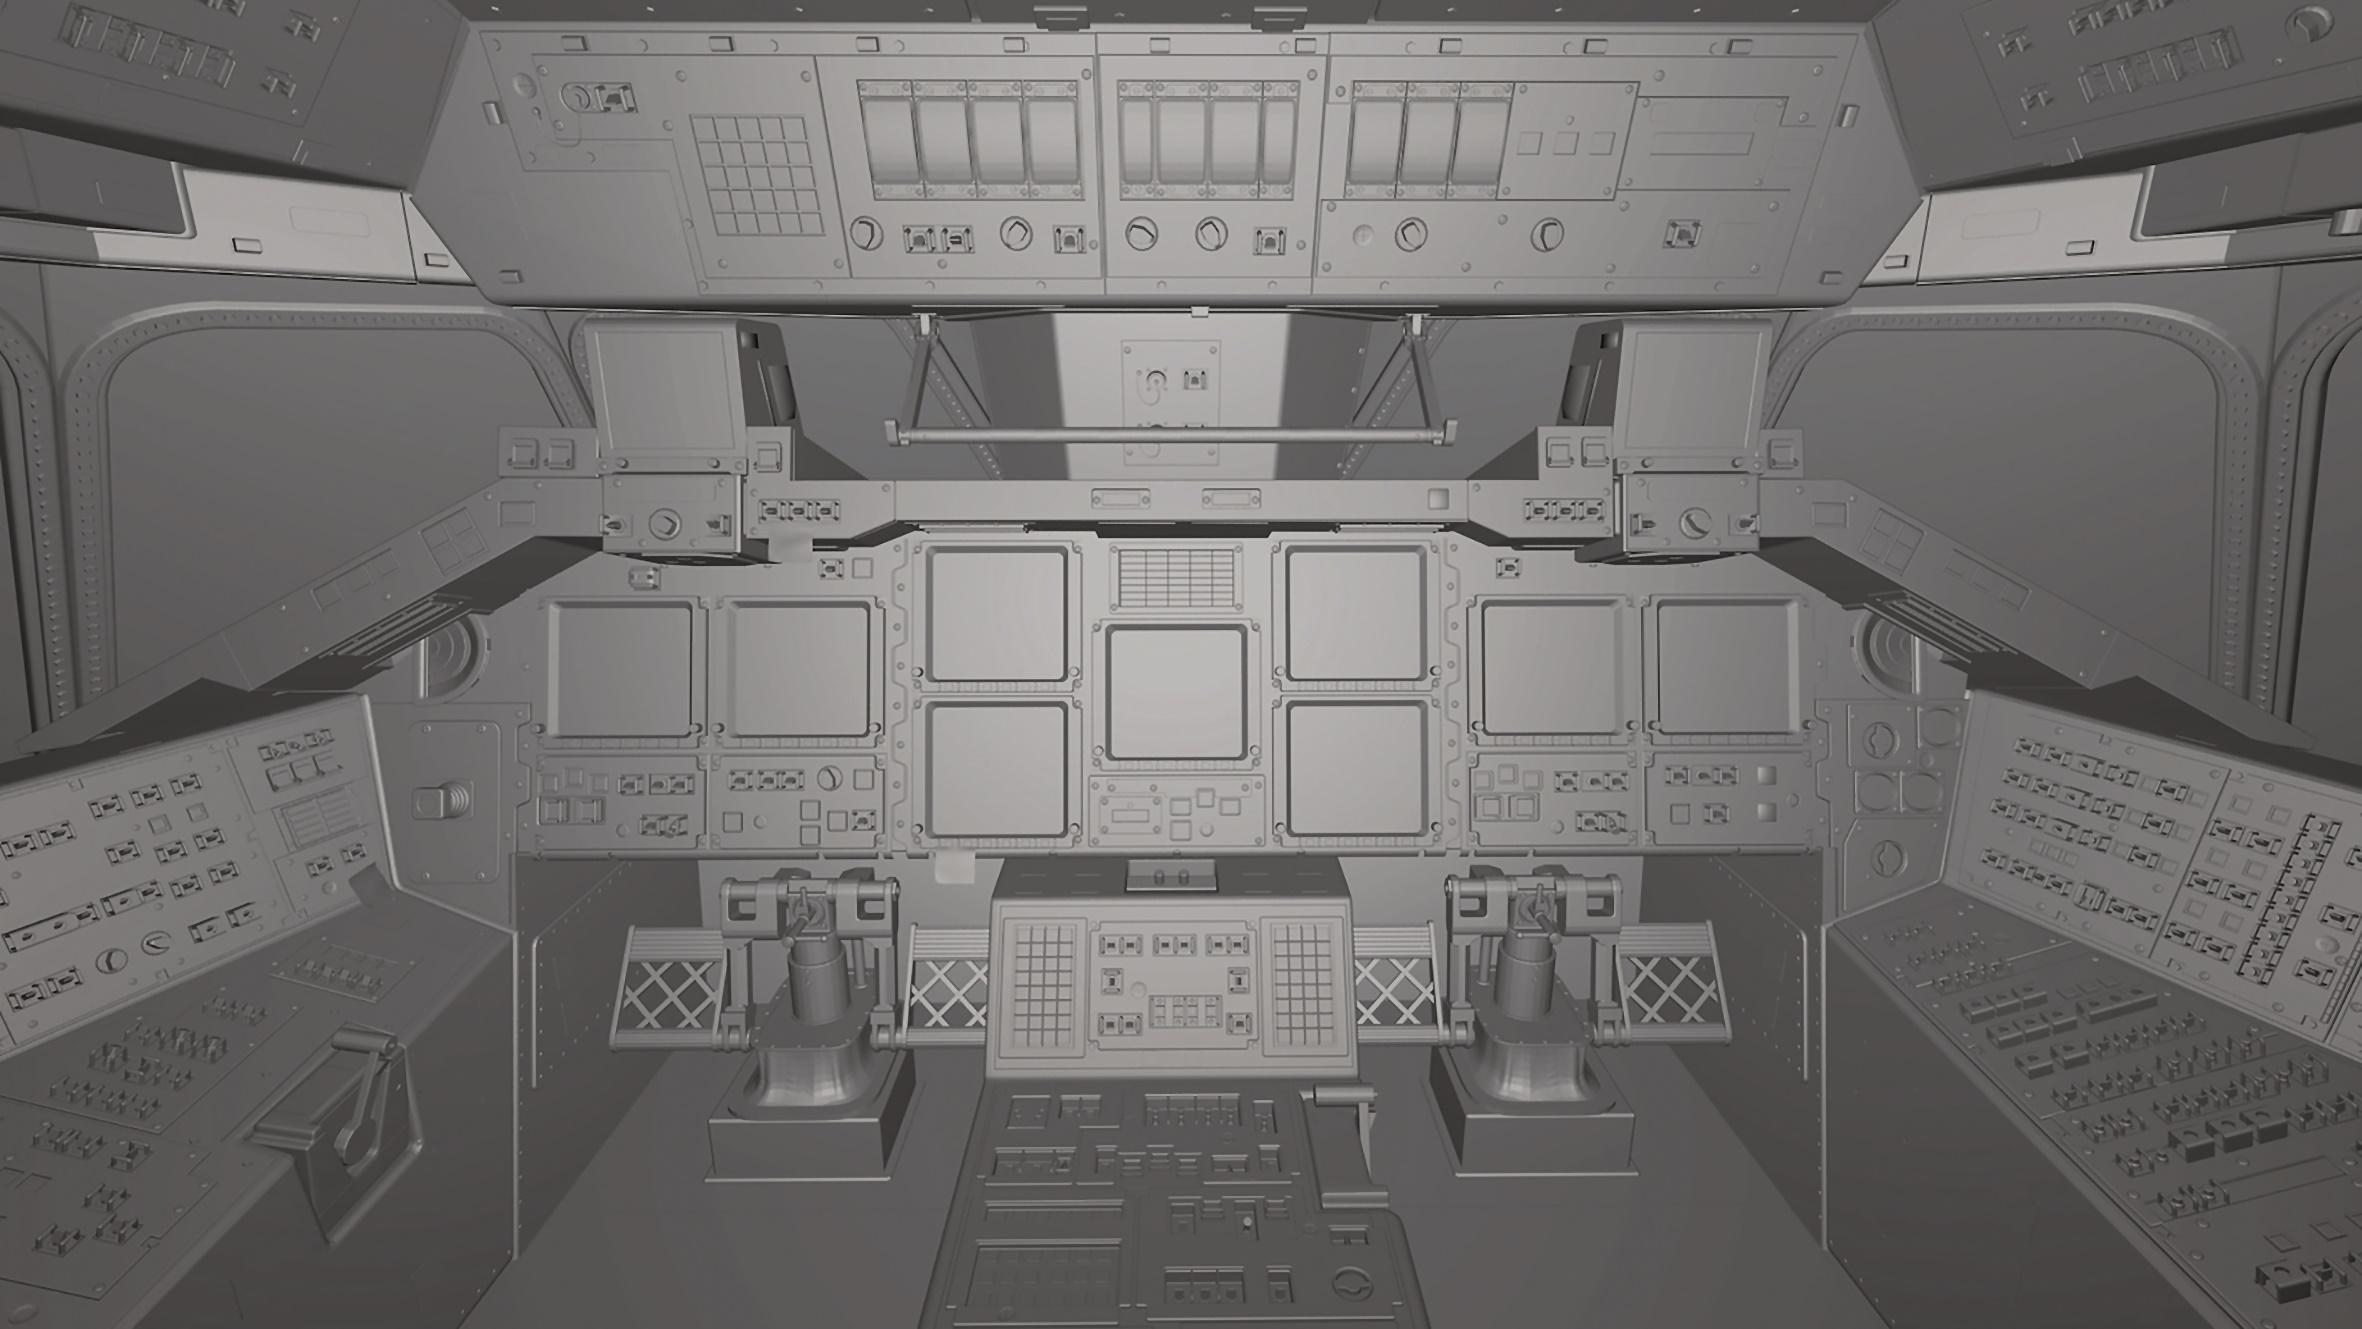 Das rohe Modell des Cockpits mit Grey Shading